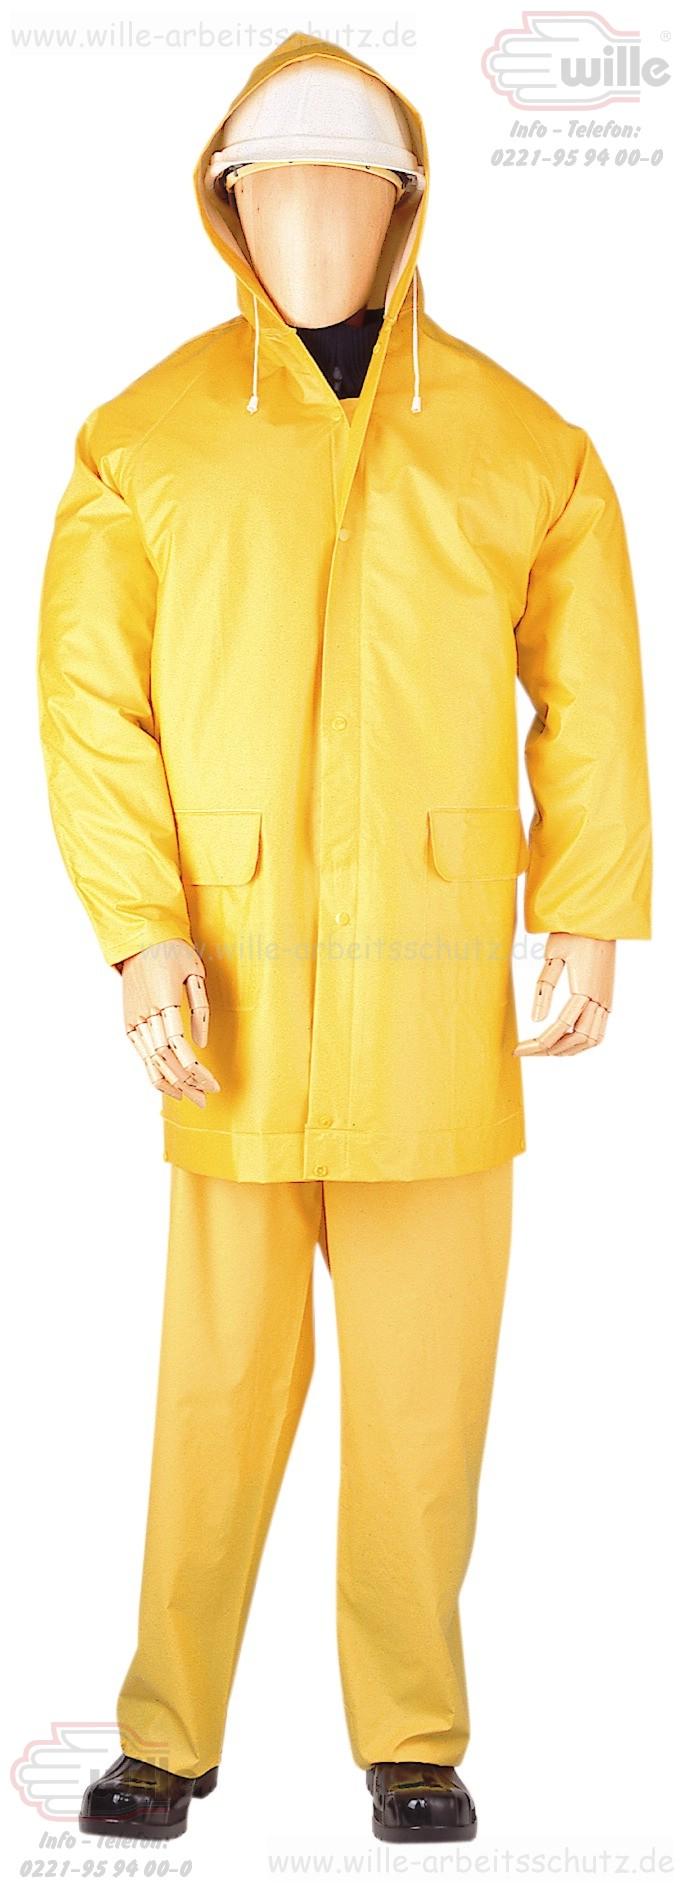 regenkleidung aus pvc